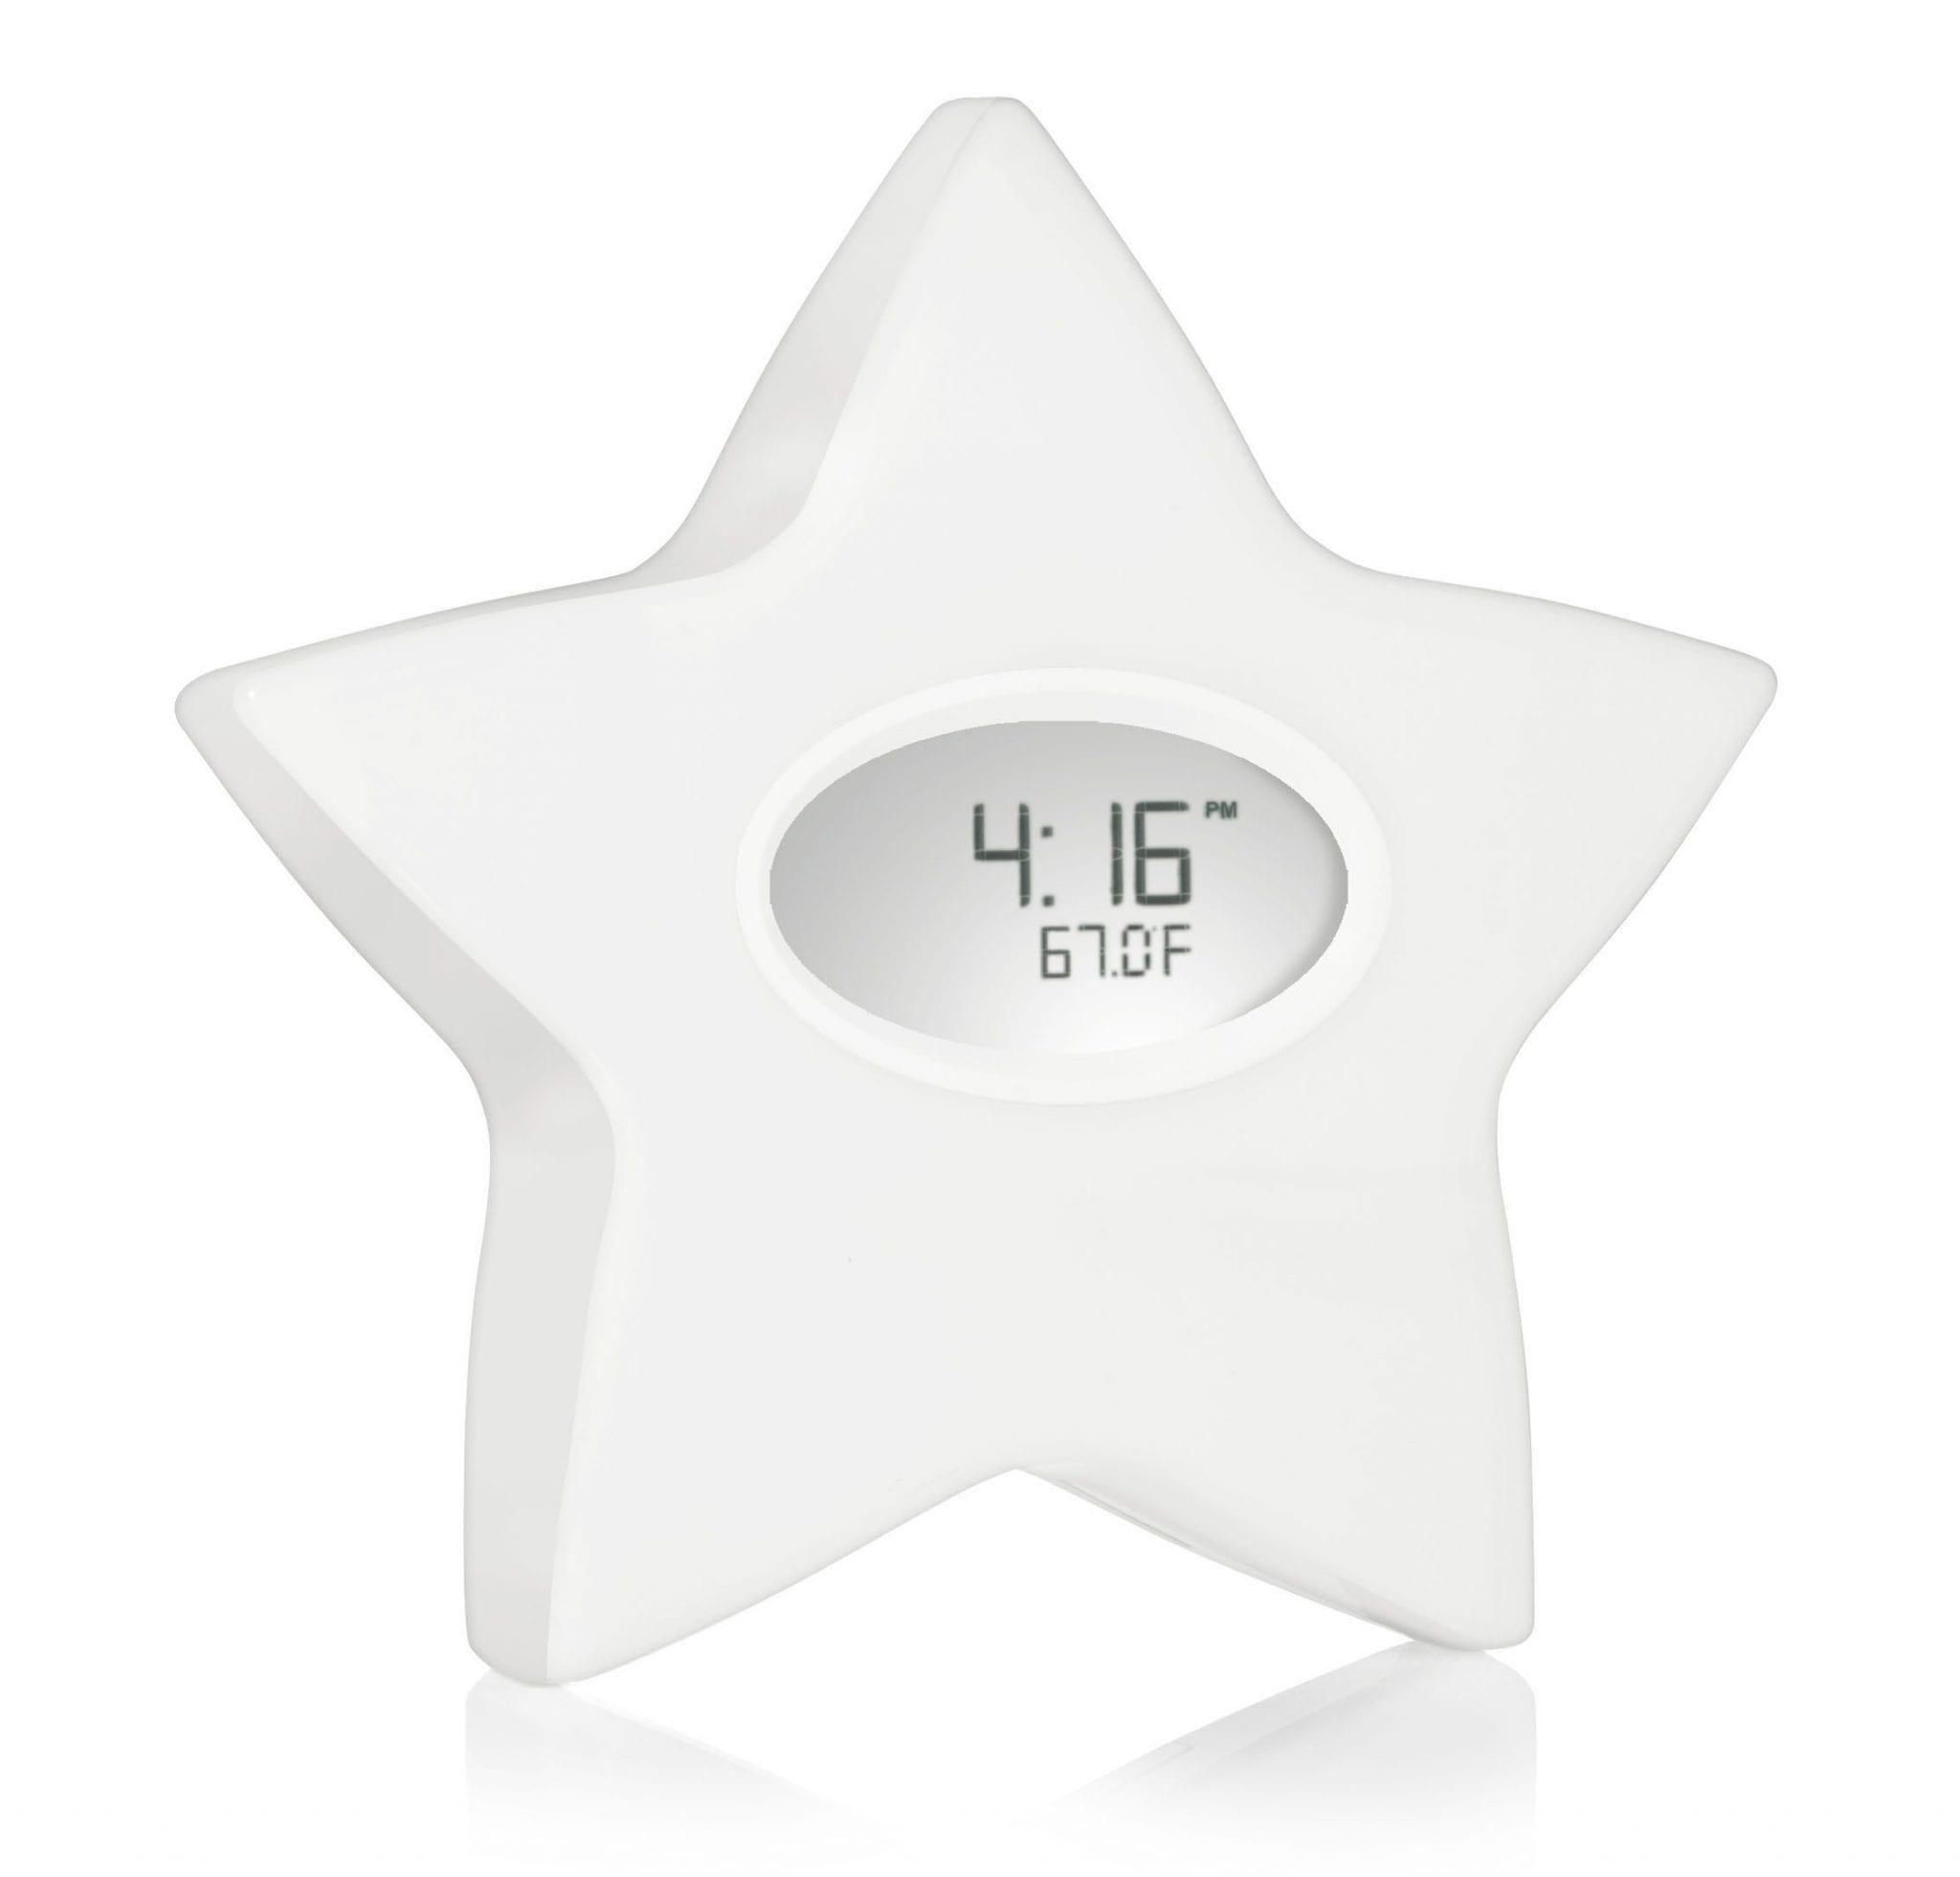 aden-anais-baby-nursery-white-noise-serenity-star-9900_0